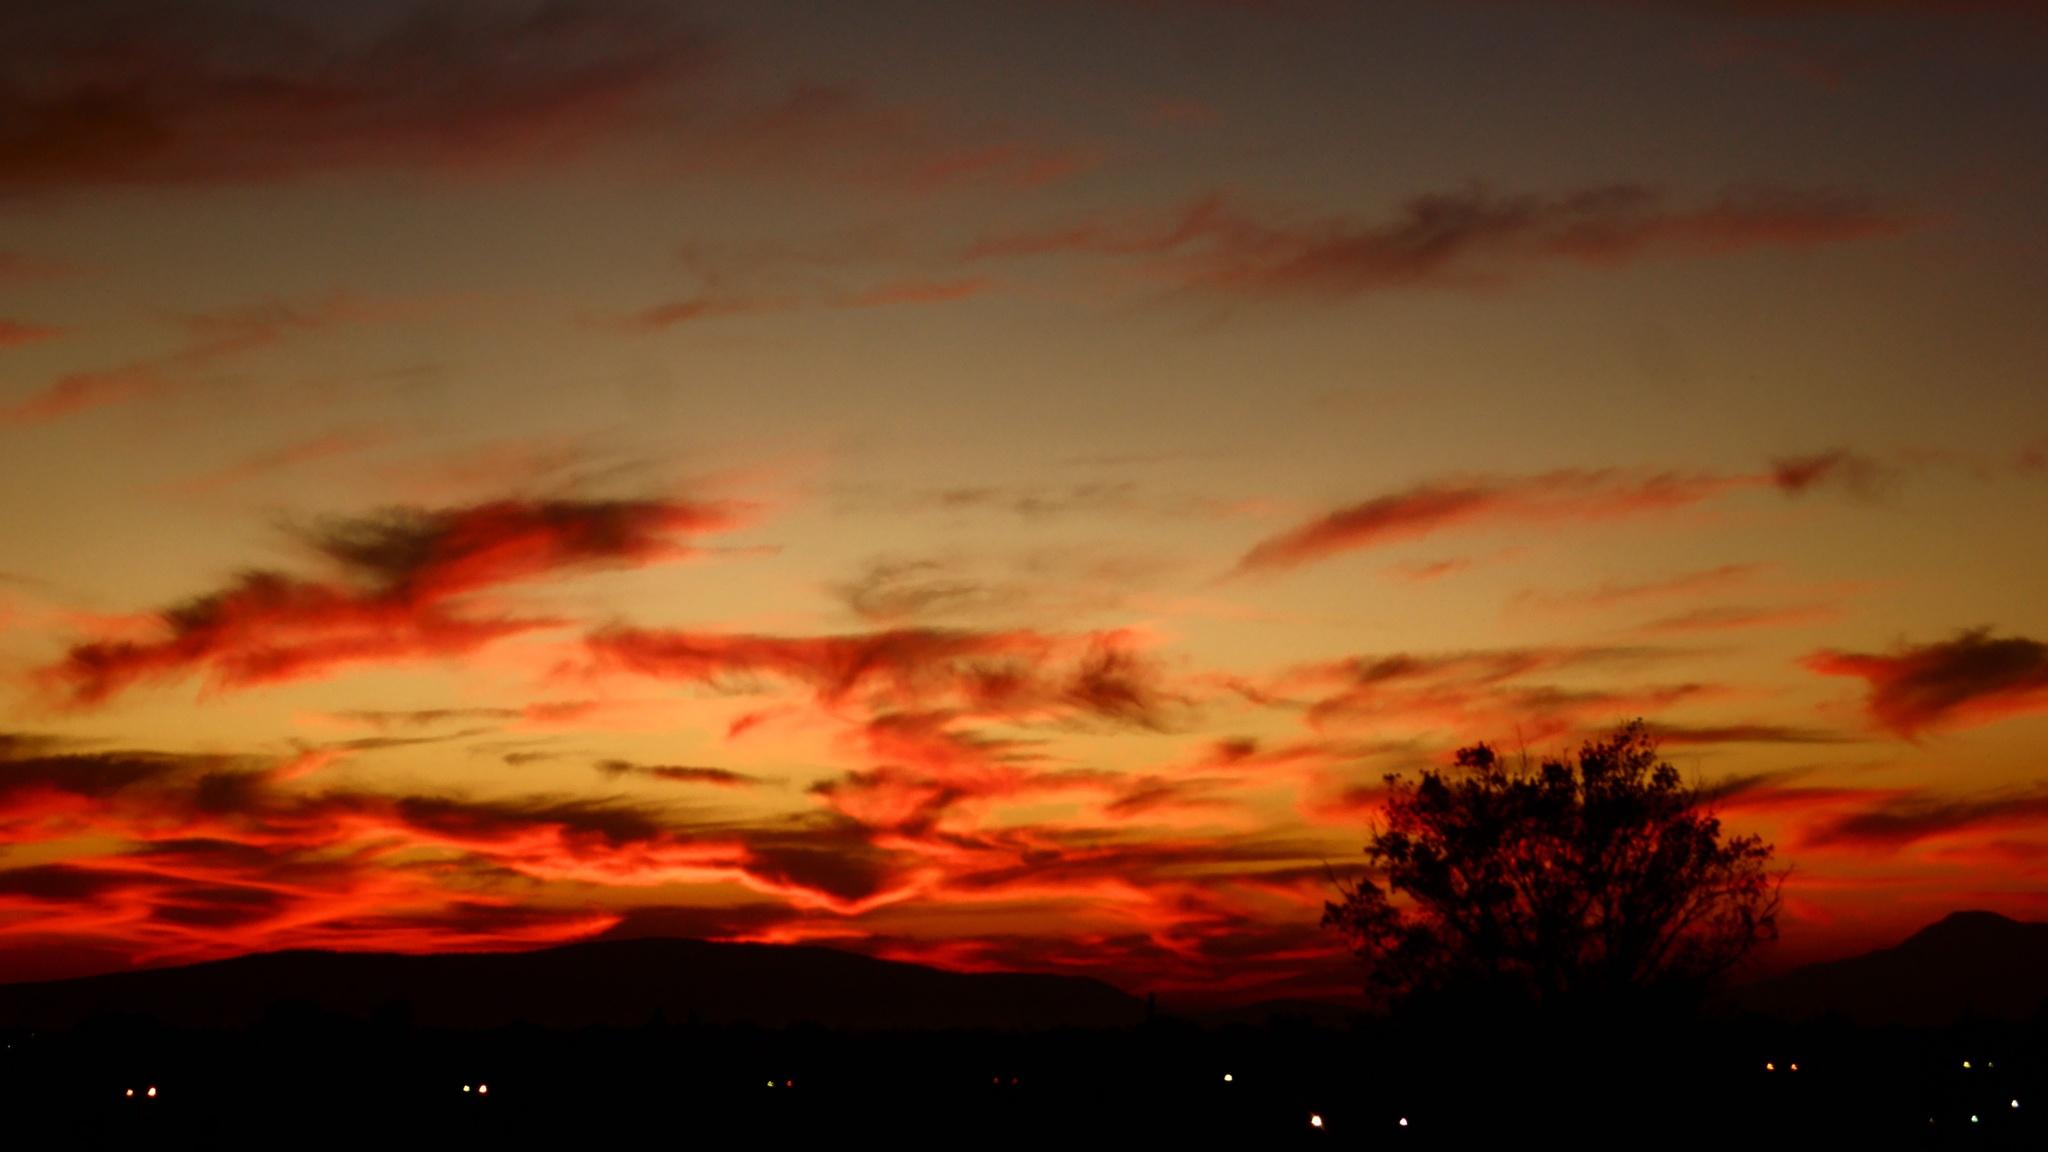 AFTER SUNSET by panagiotiskotsarinis